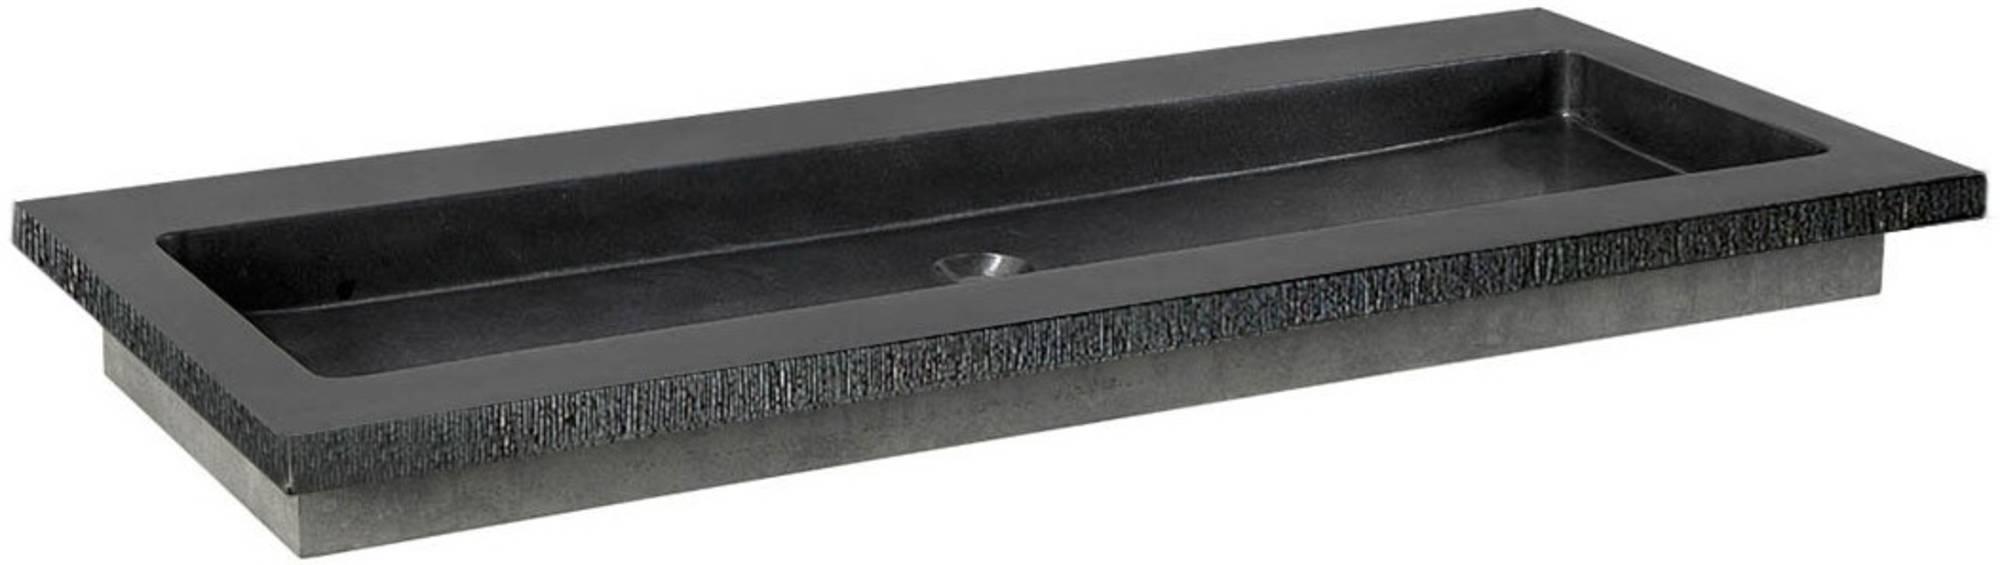 Ben Naturno Wastafel Graniet Gezoet Gefrijnd 100,5x51,5x3 cm 1 Krg. Zwart